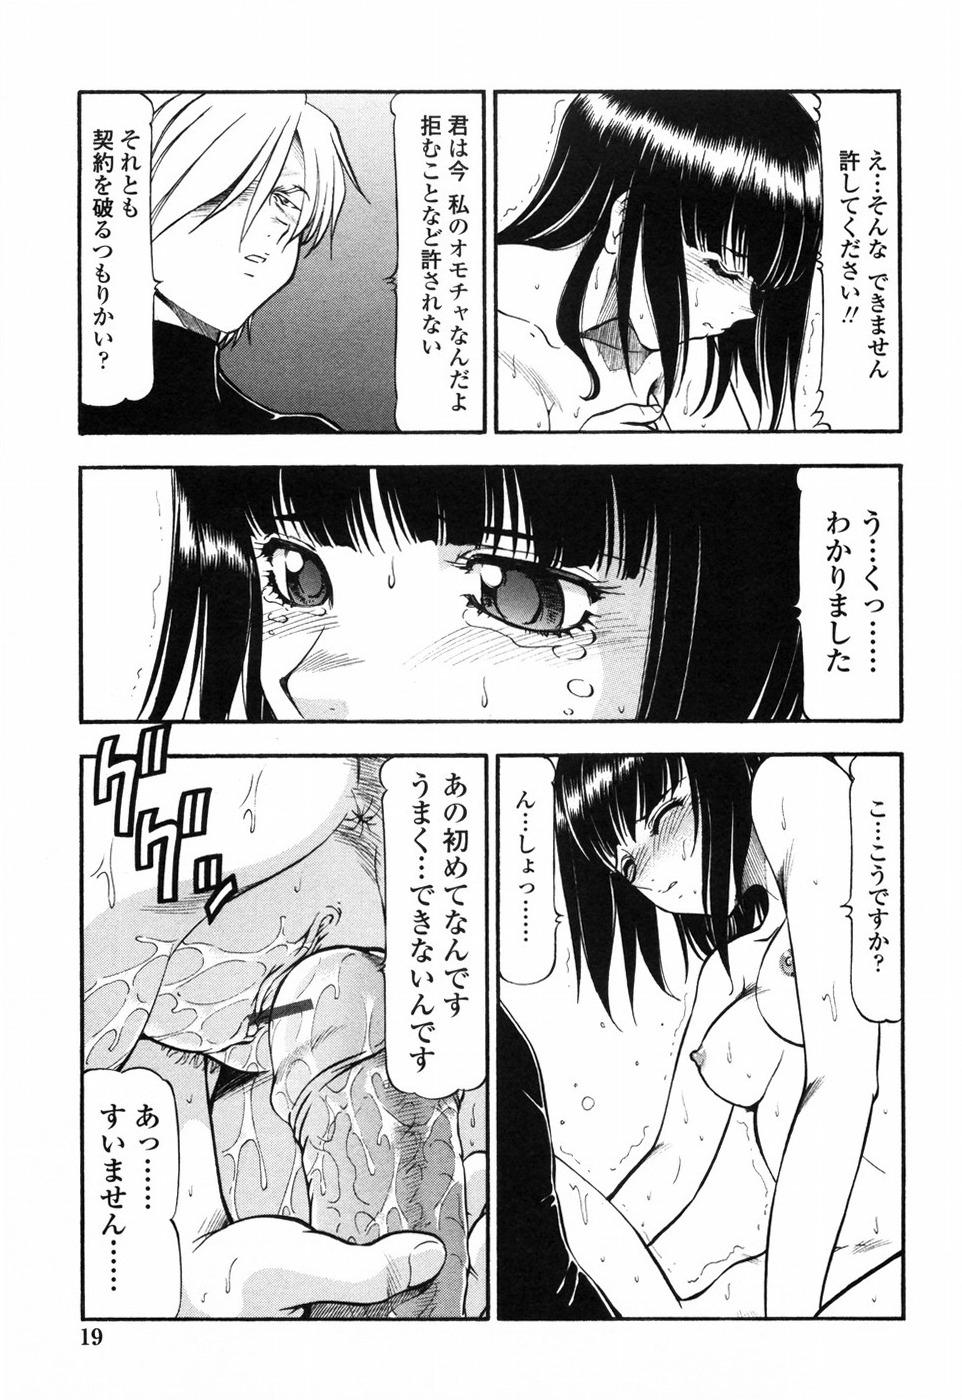 Kichiku Houteishiki - Equation of brutal person 24